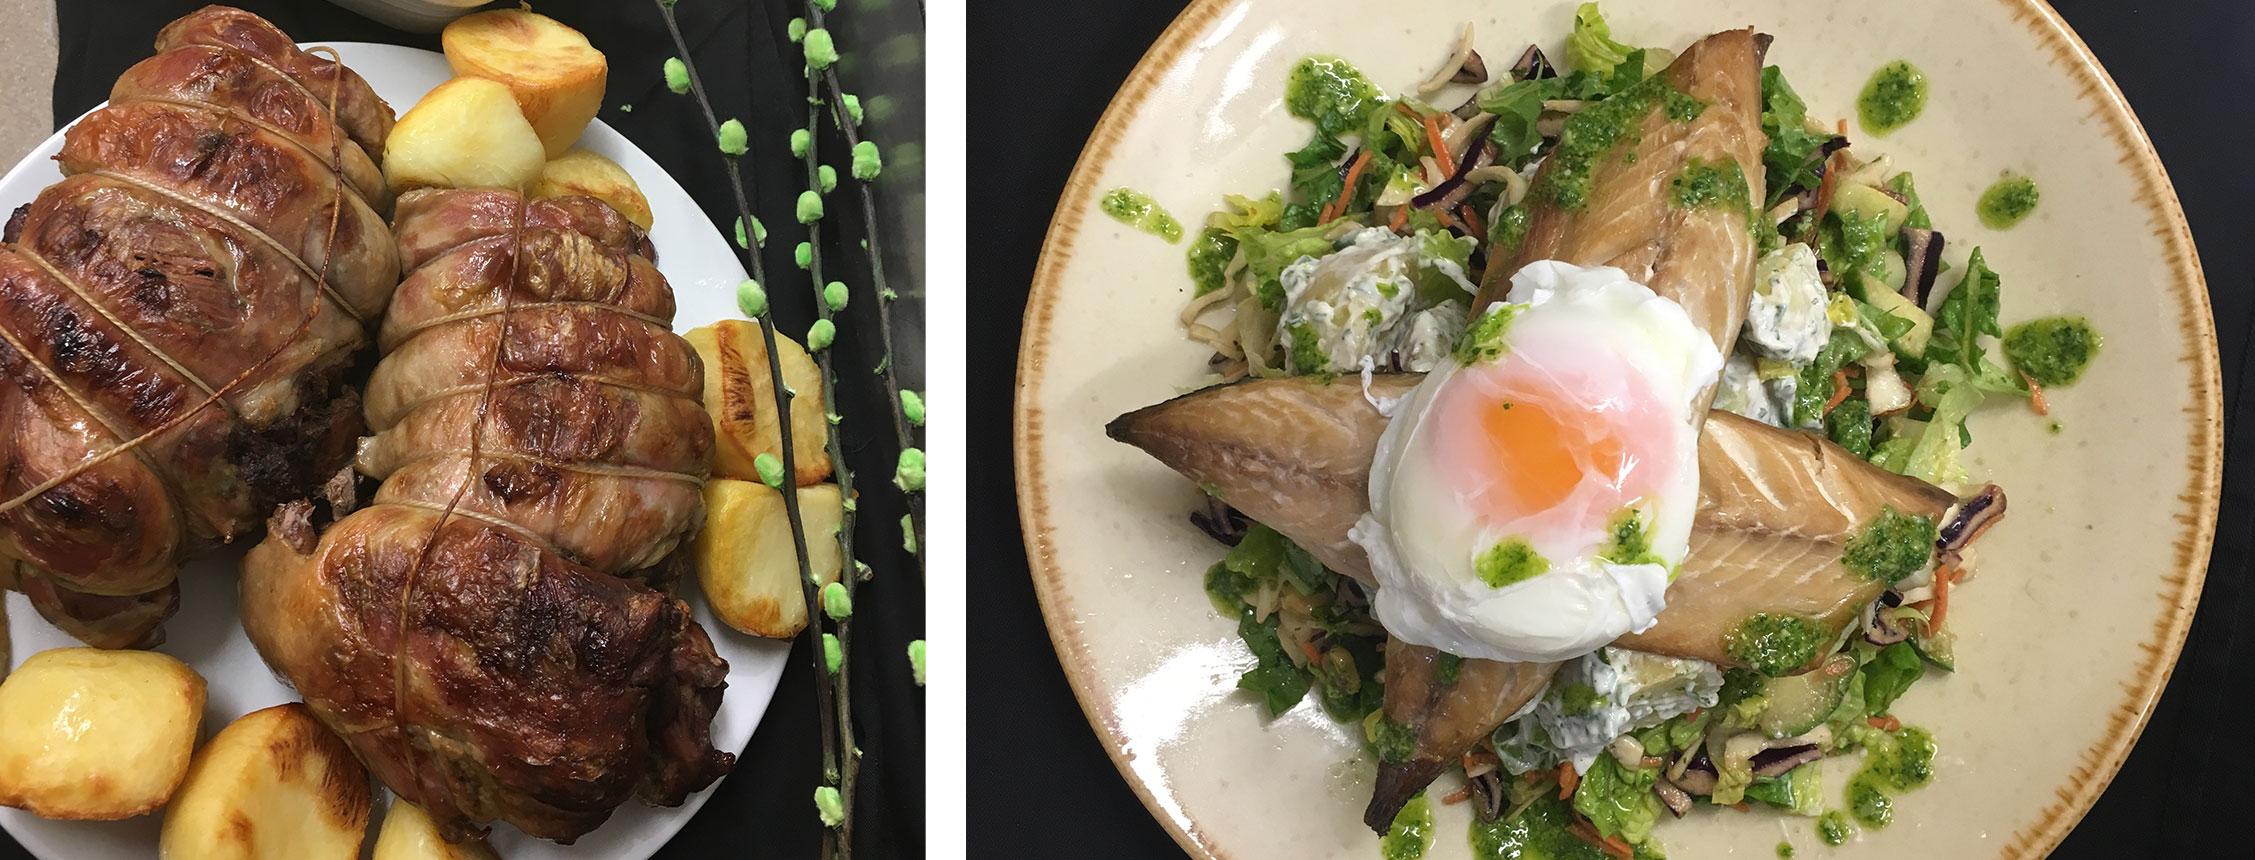 fish and egg - roast dinner